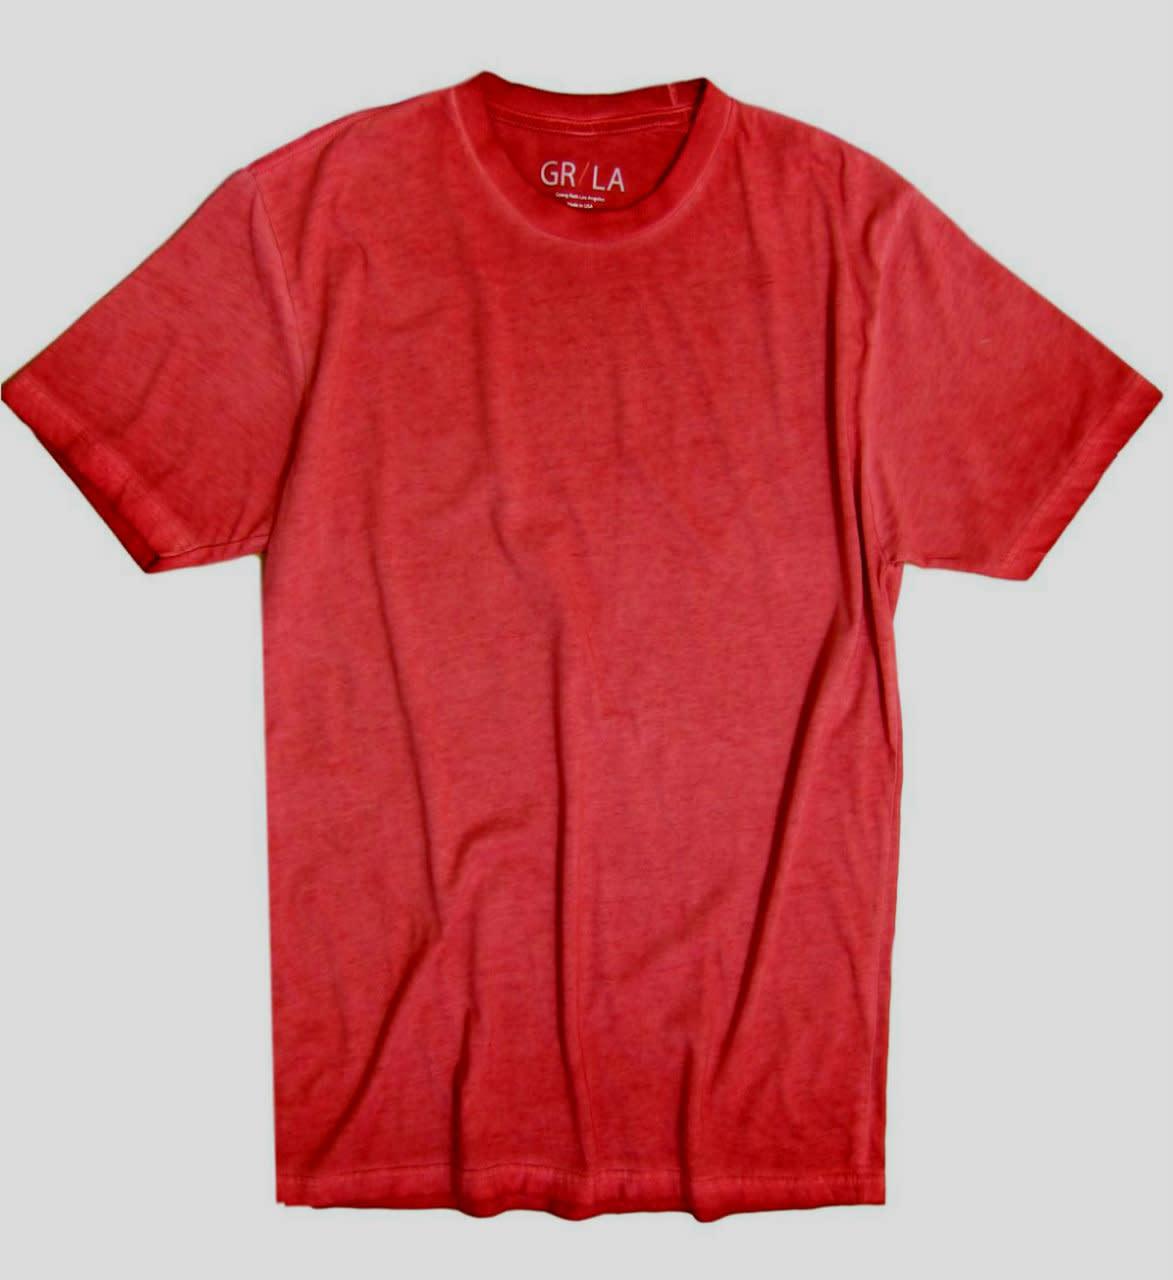 Georg Roth Crew Neck S/S T-Shirt